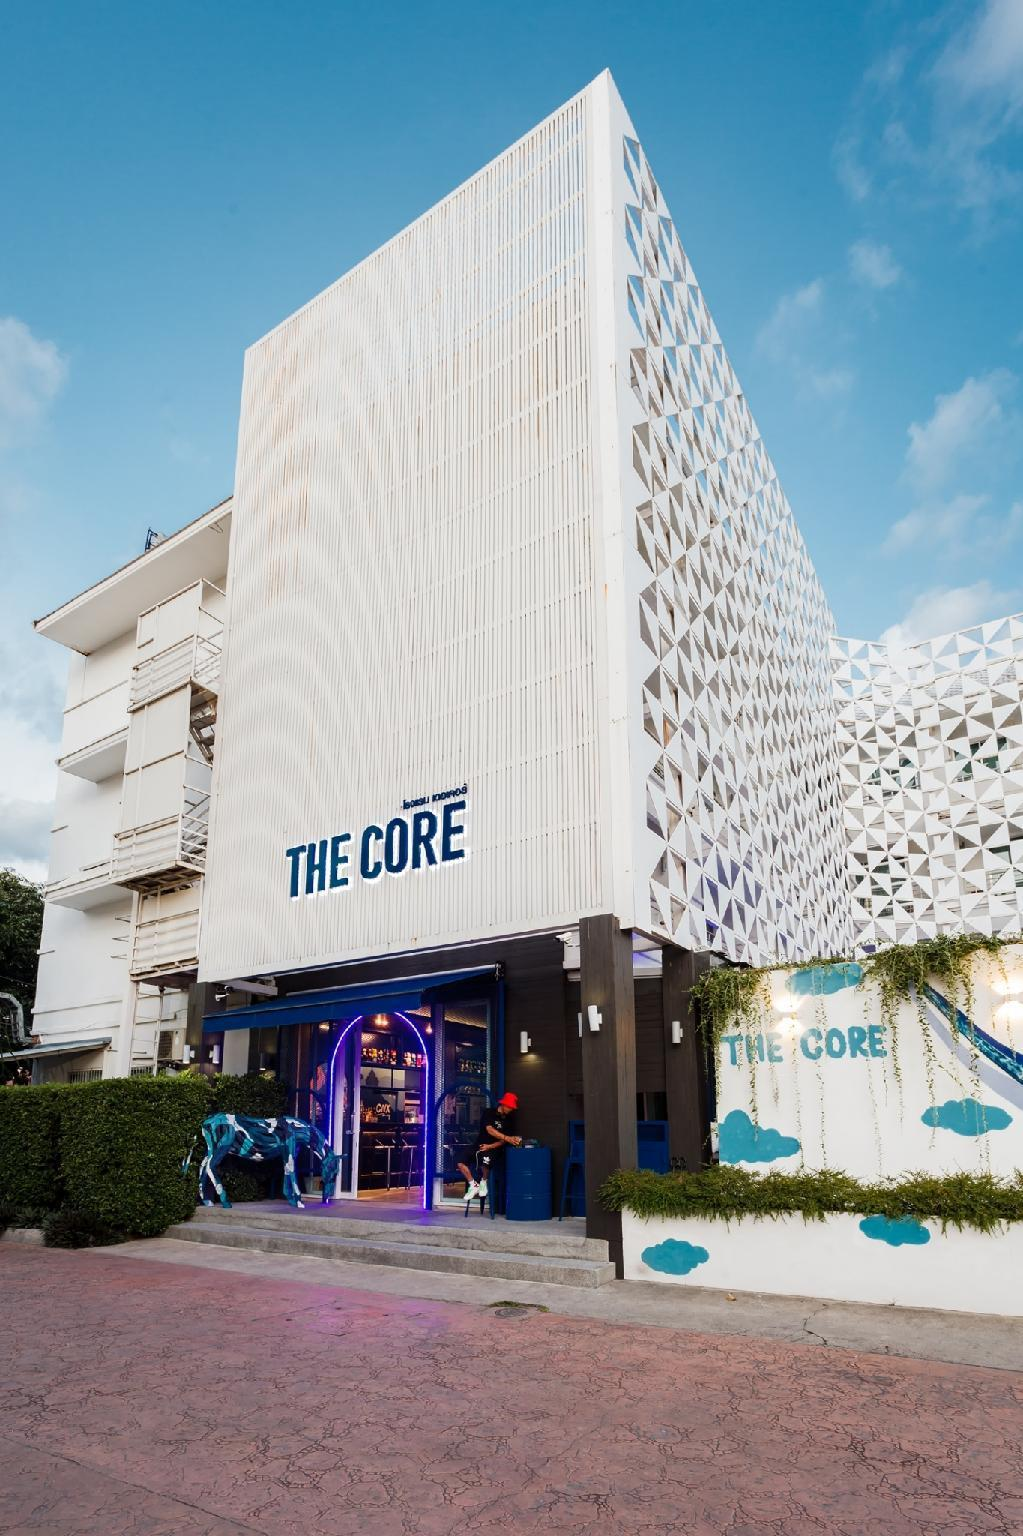 The Core St. by Stay Now โรงแรมเดอะคอร์